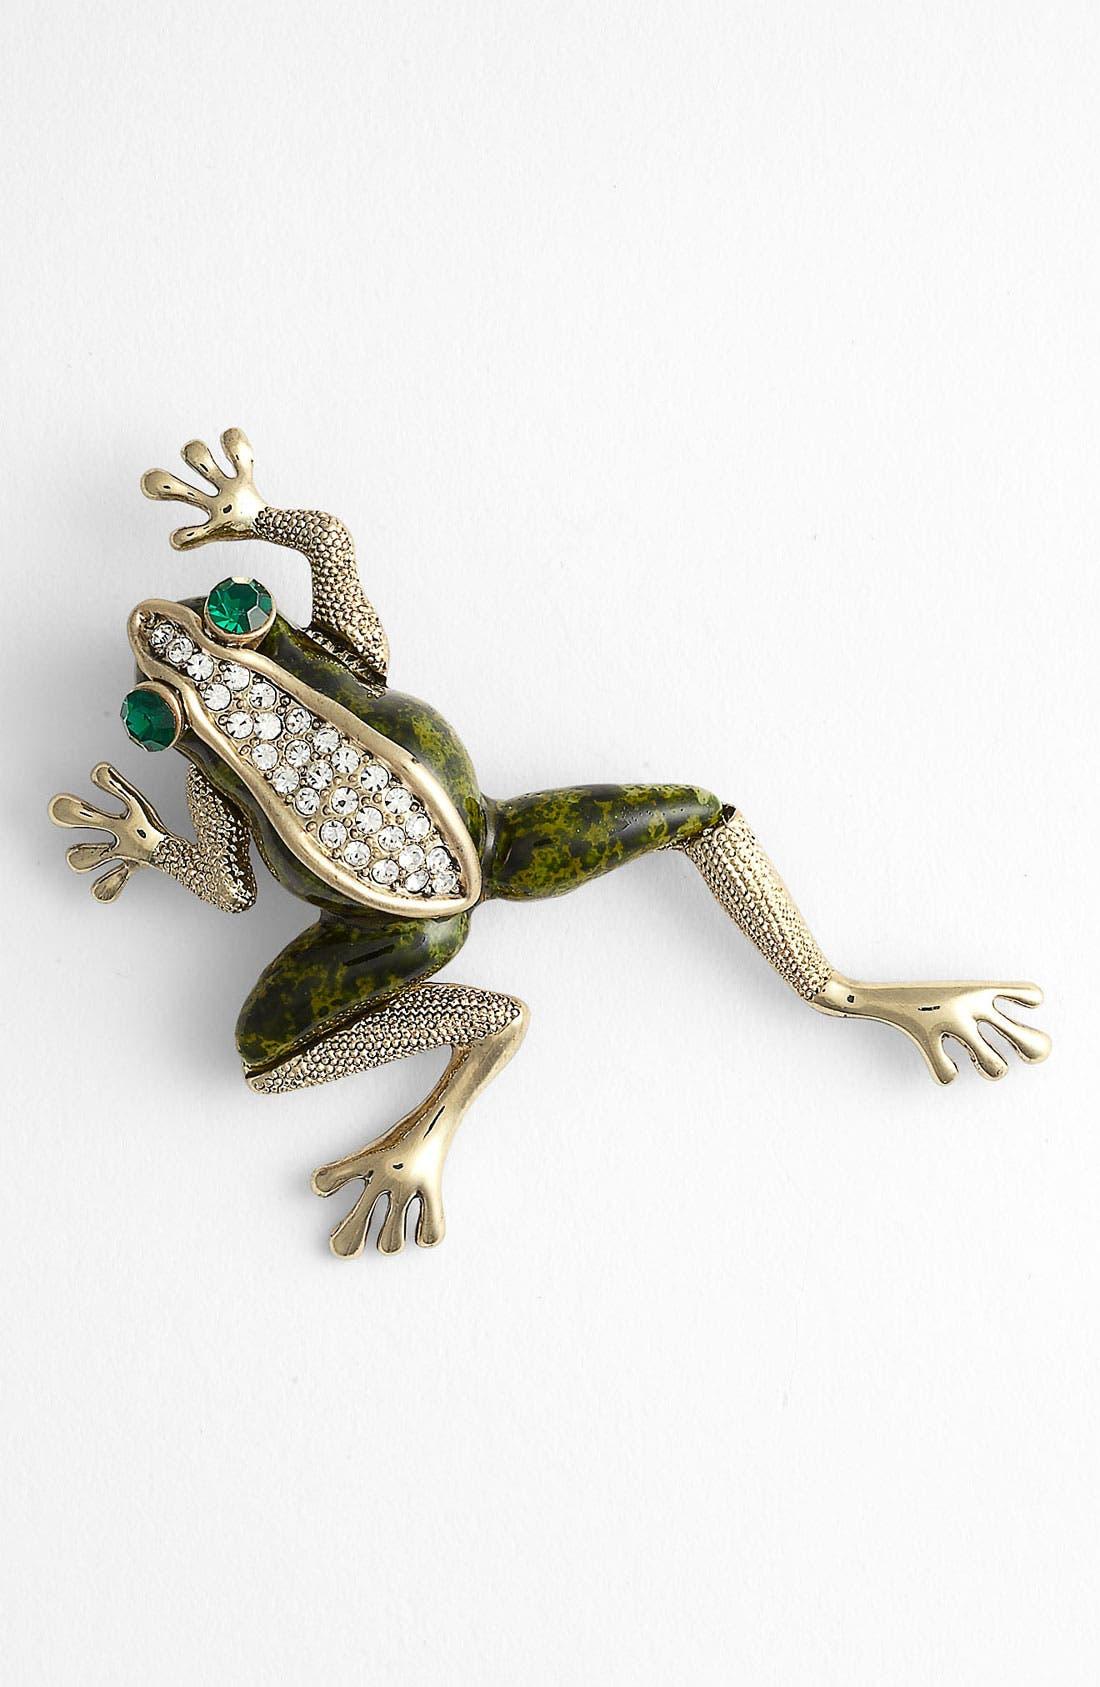 Alternate Image 1 Selected - Tasha 'Critters' Frog Brooch